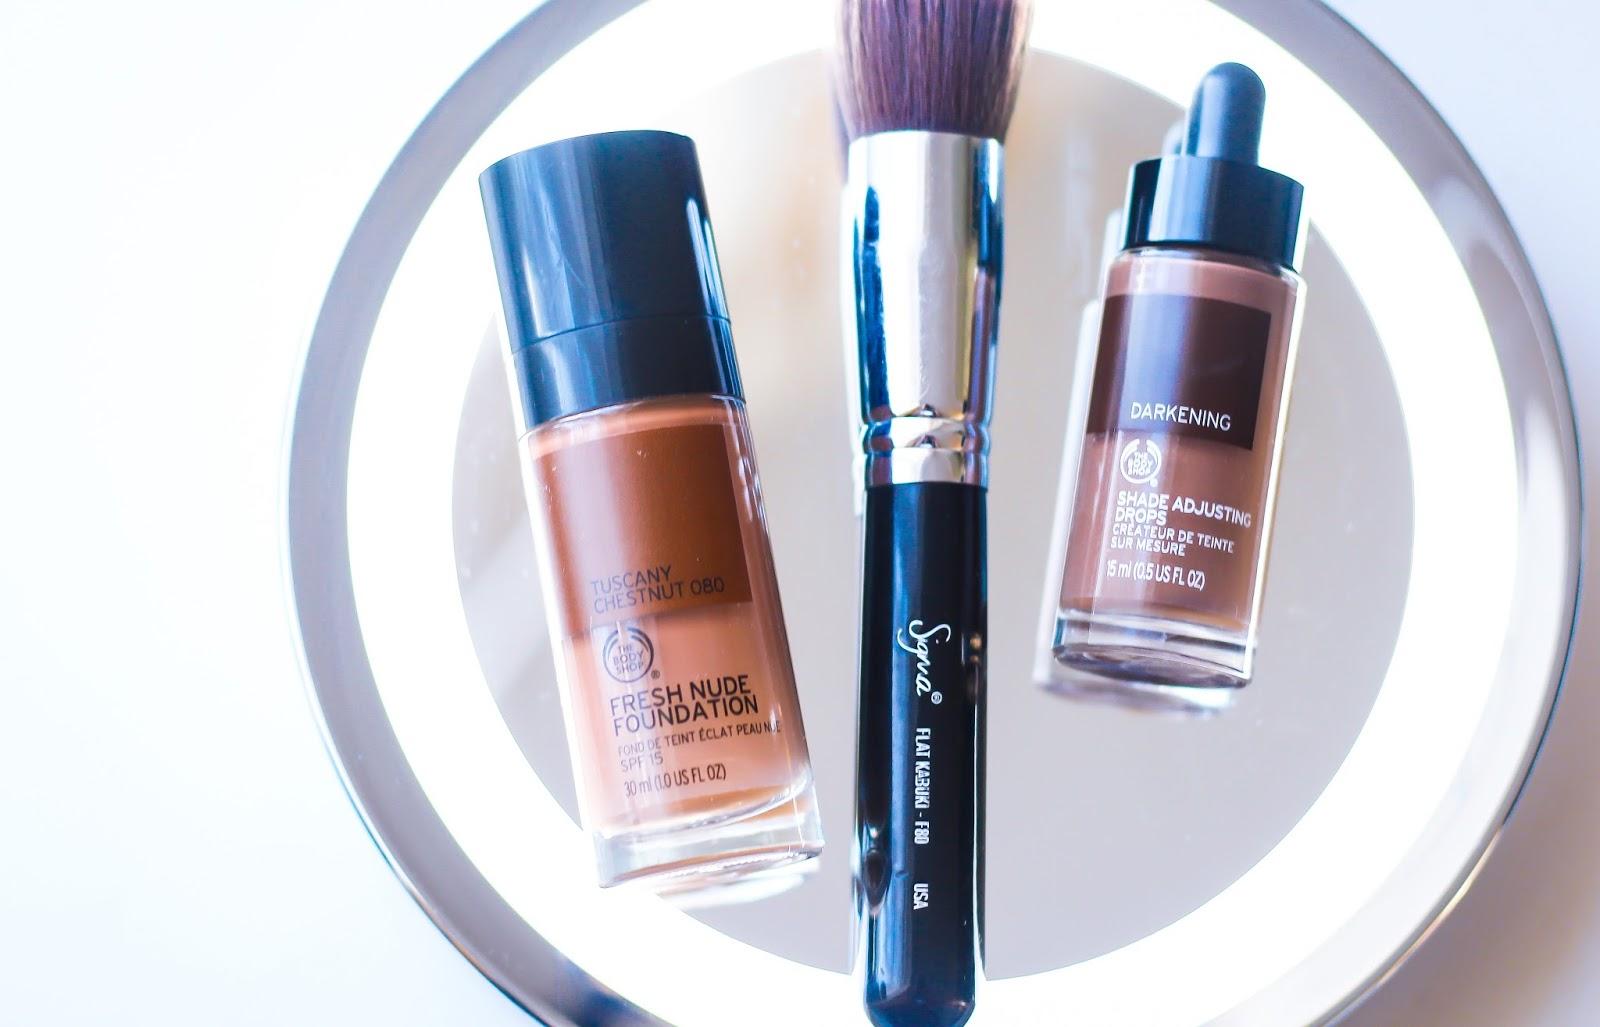 The Body Shop Fresh Nude Foundation  (Tuscany Chestnut) and Darkening Shade Adjusting Drops